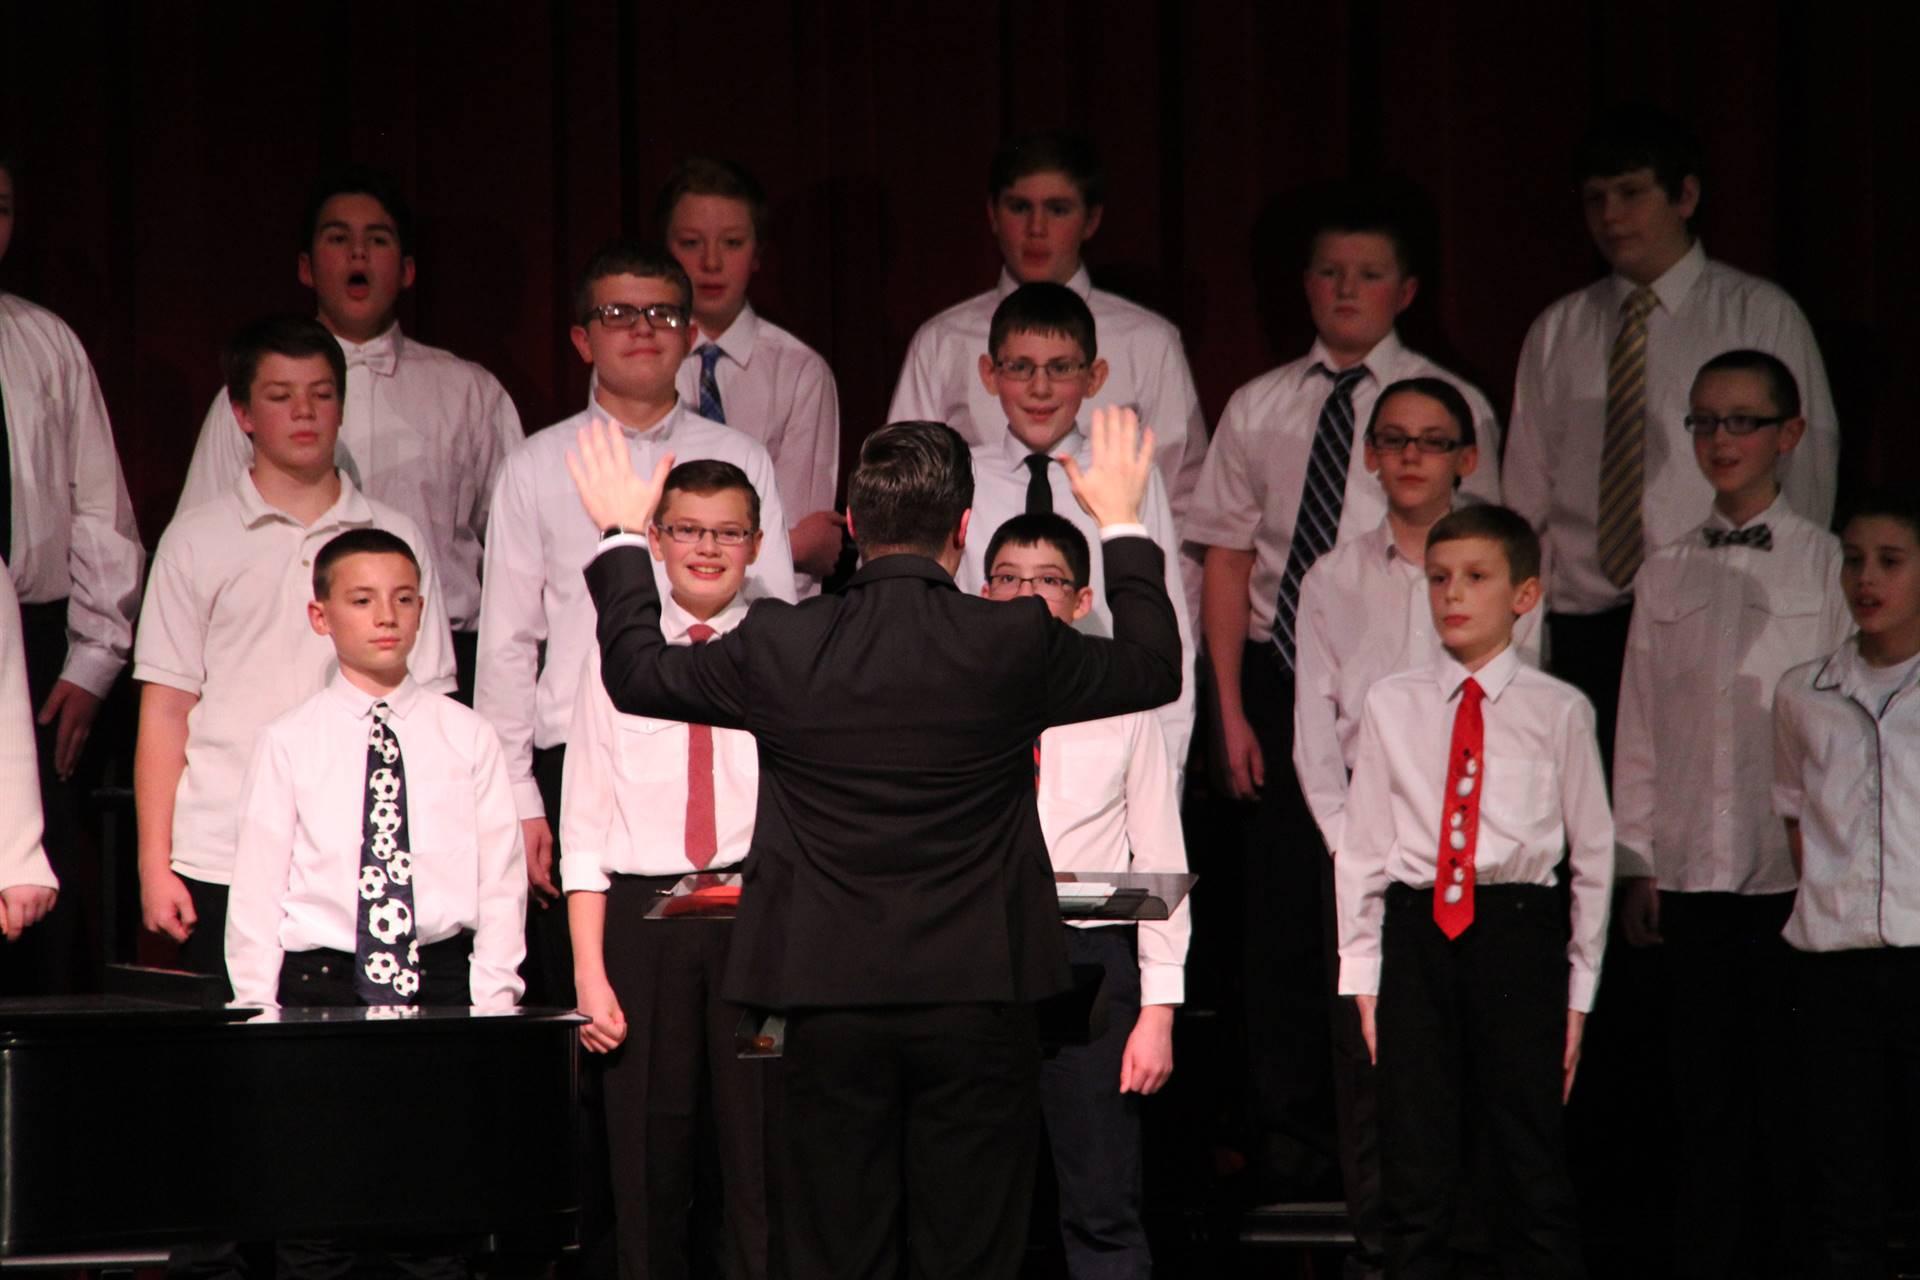 mister vanderslice conducting chorus